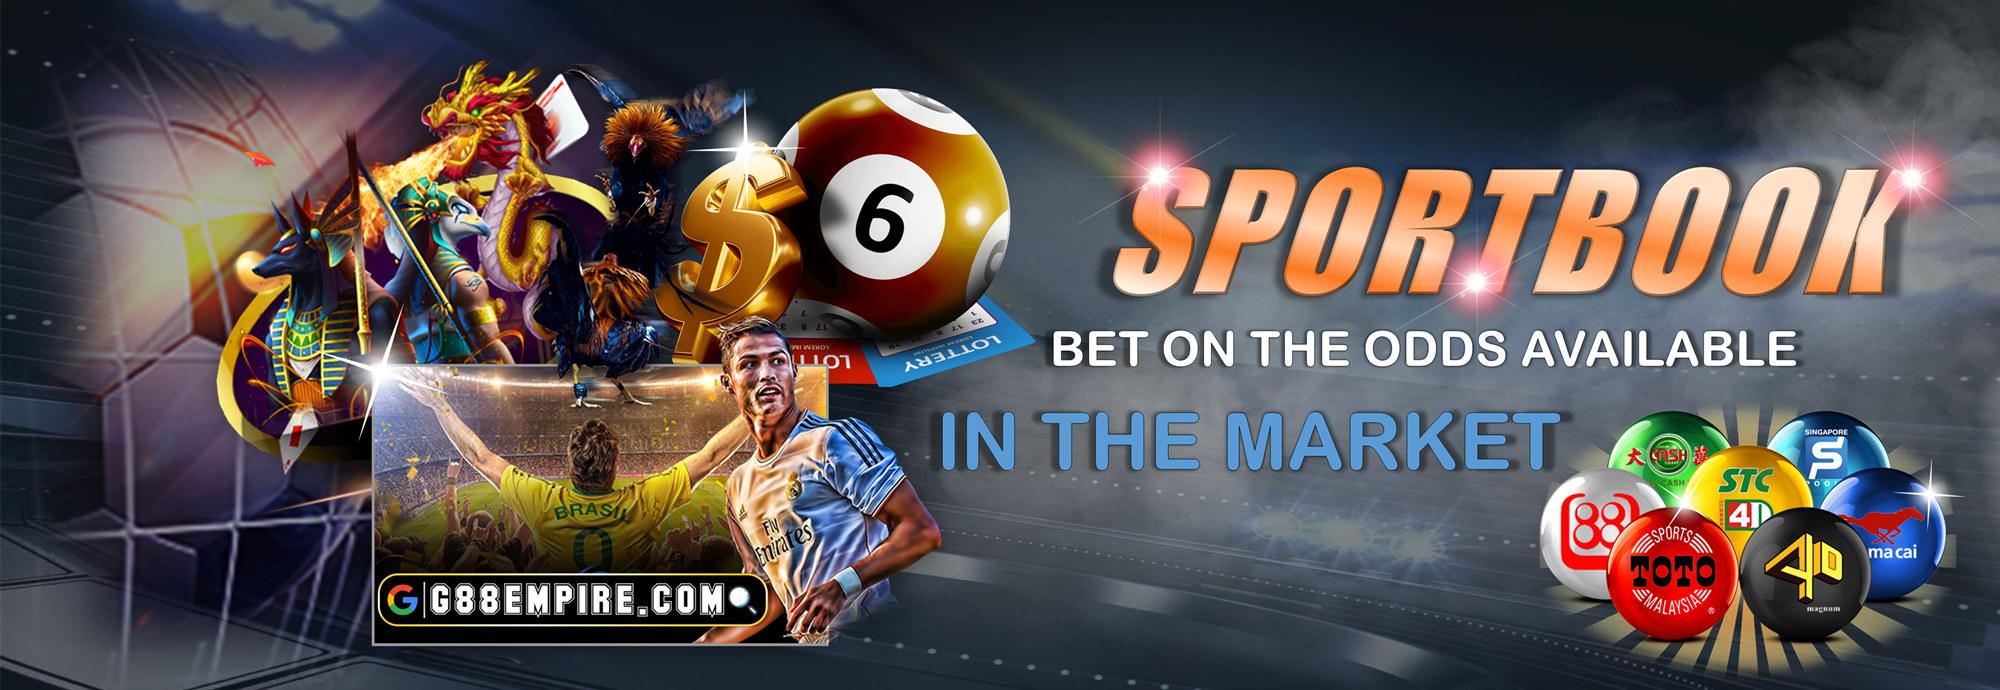 SportsBook Malaysia and Singapore Trust Online Casino, Live Slot Online Casino Game Win Cuci Jackpot SCR888 SCR Ace333 Ace Leocity LPE Newtown Gw99 P2P Joker Pussy888 Pussy 918Kiss Kiss Live22 Mega Xe88 Joker G88Empire GrandEmpire